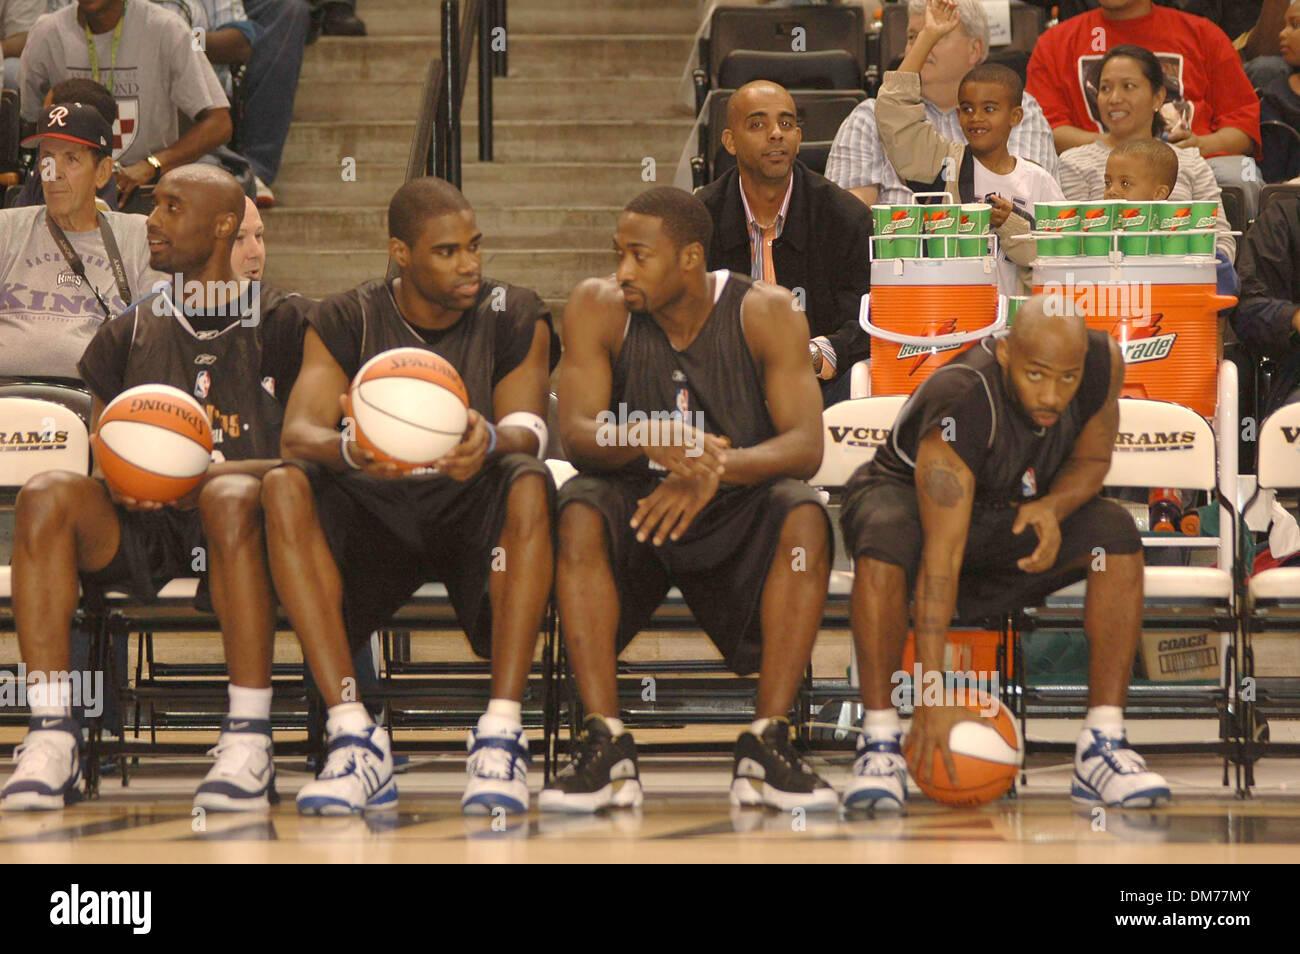 Oct 08 2005 Richmond VA USA Washington Wizards players